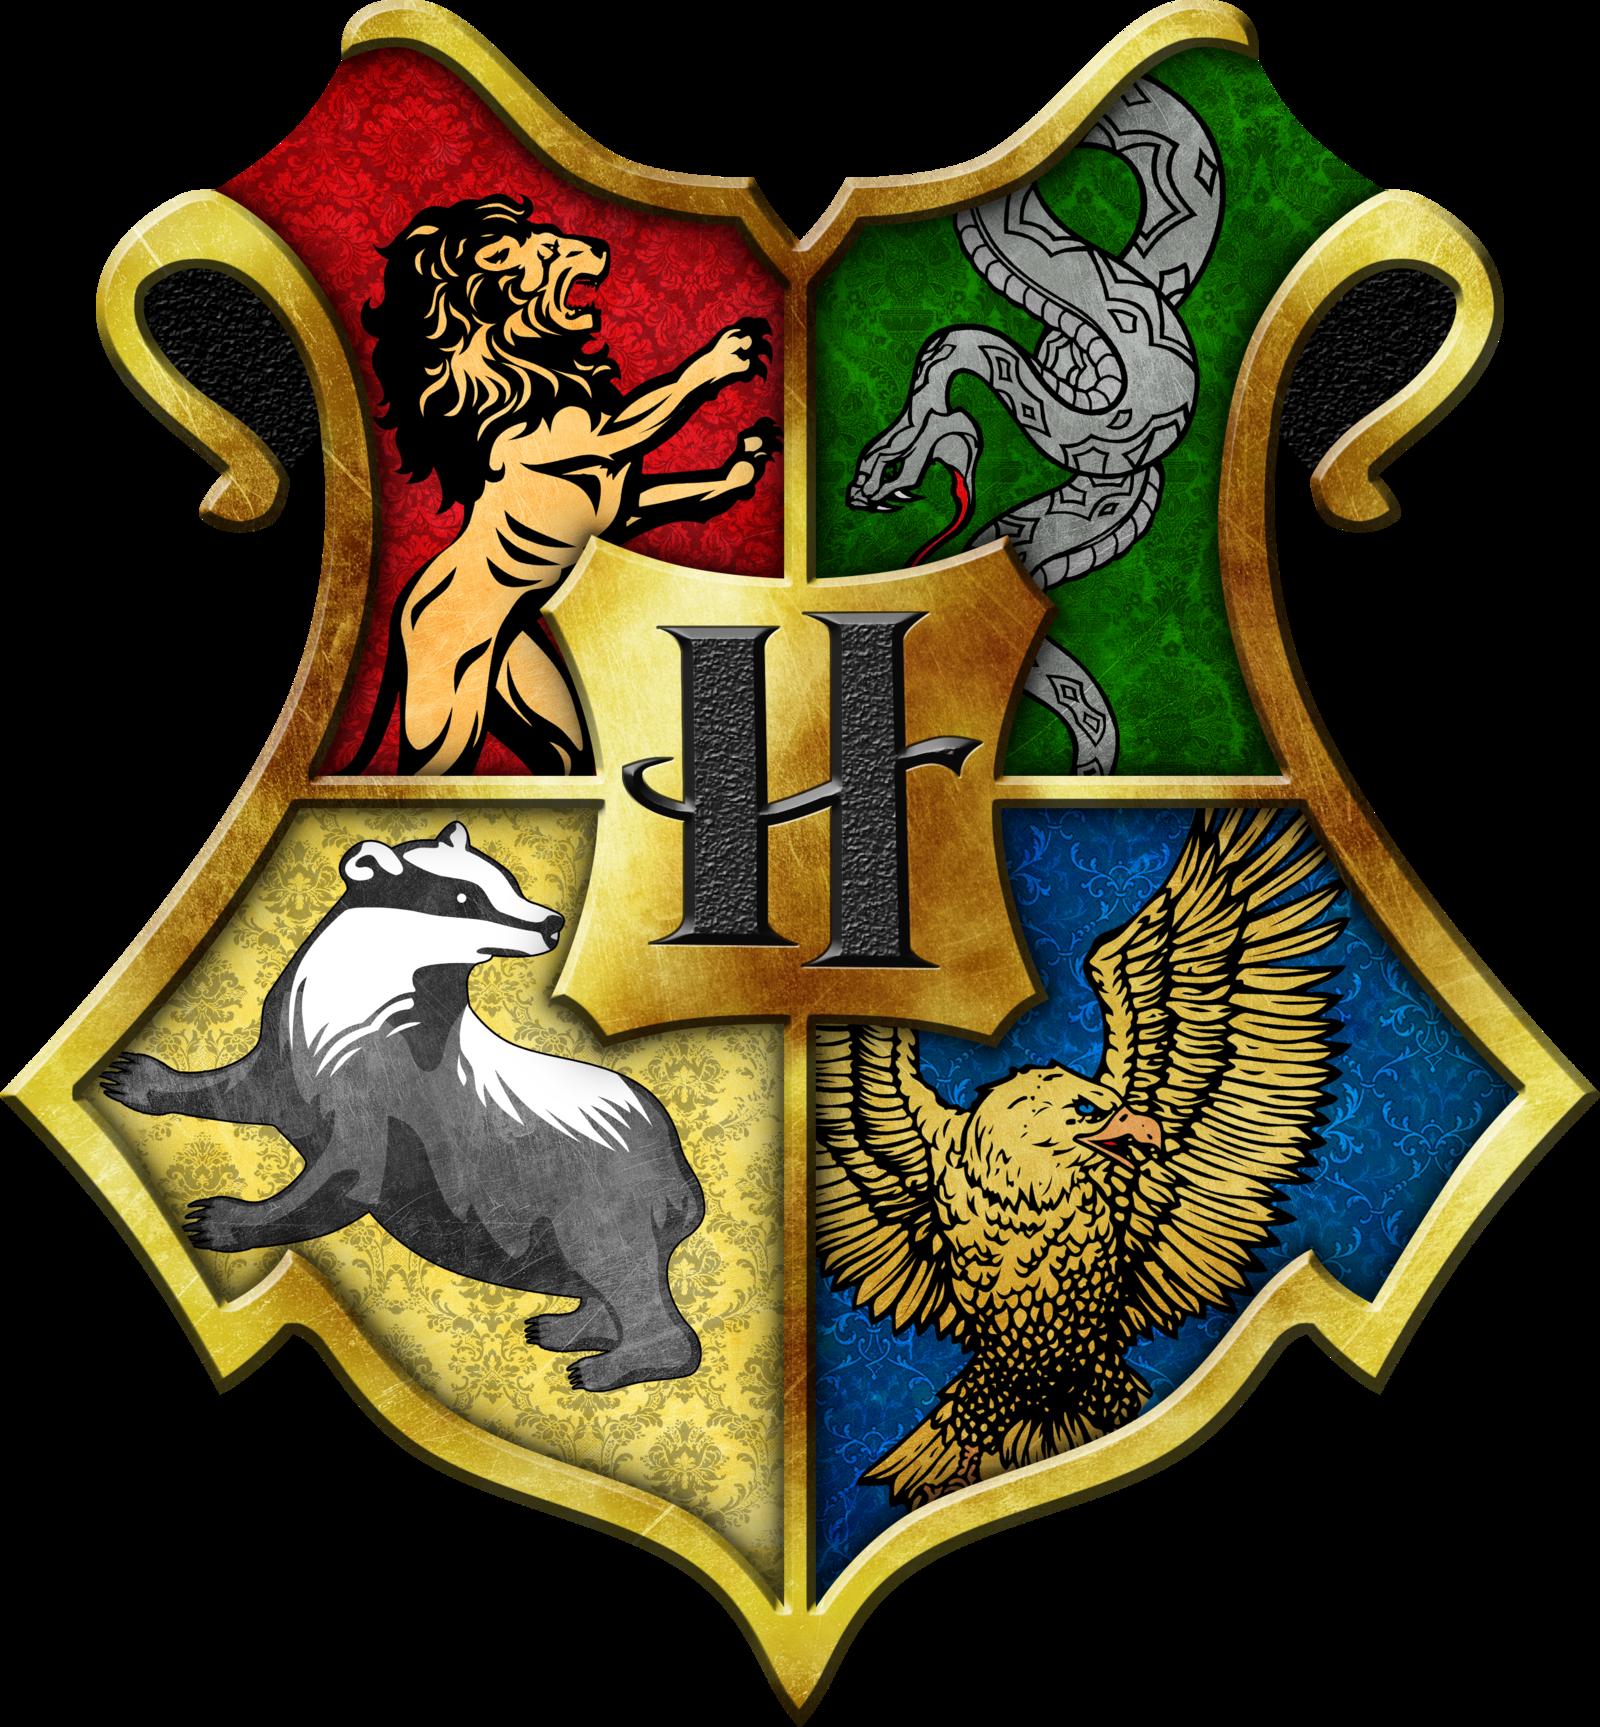 Harry potter house clipart png download The Enneagram Goes To Hogwarts | Pinterest | Hogwarts crest ... png download